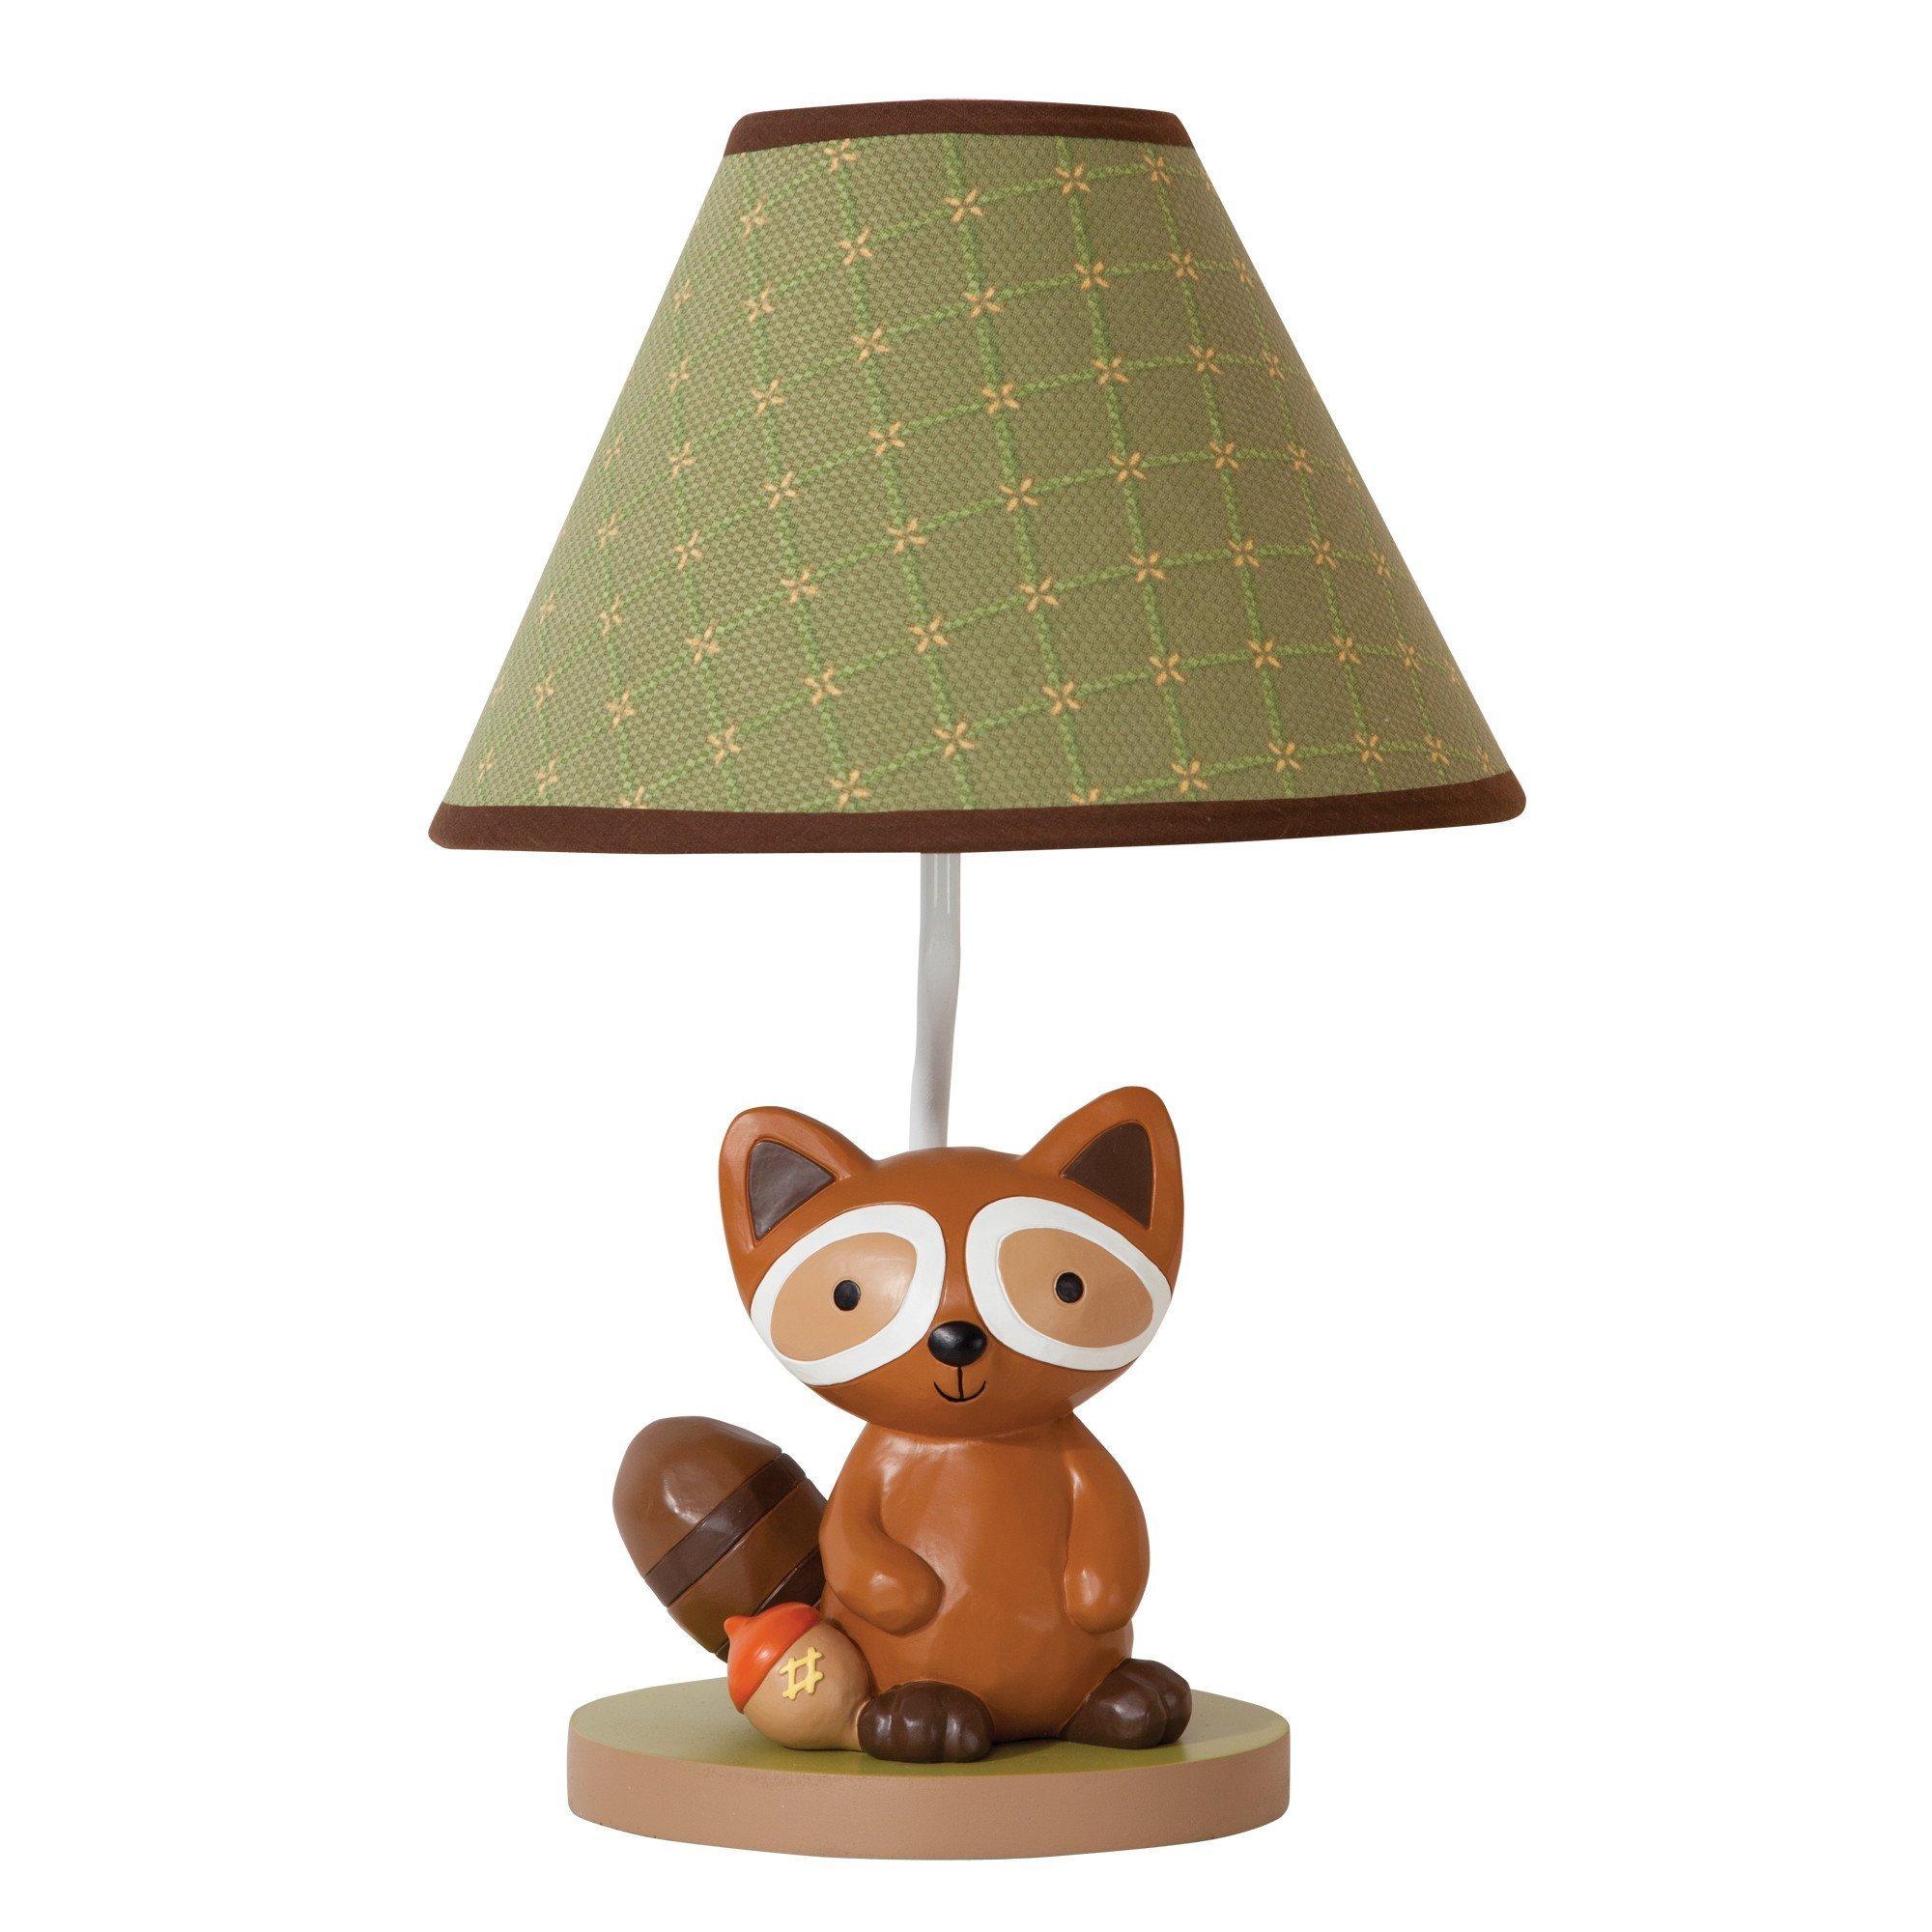 Lambs Ivy Raccoon Lamp with Shade and Bulb - Echo